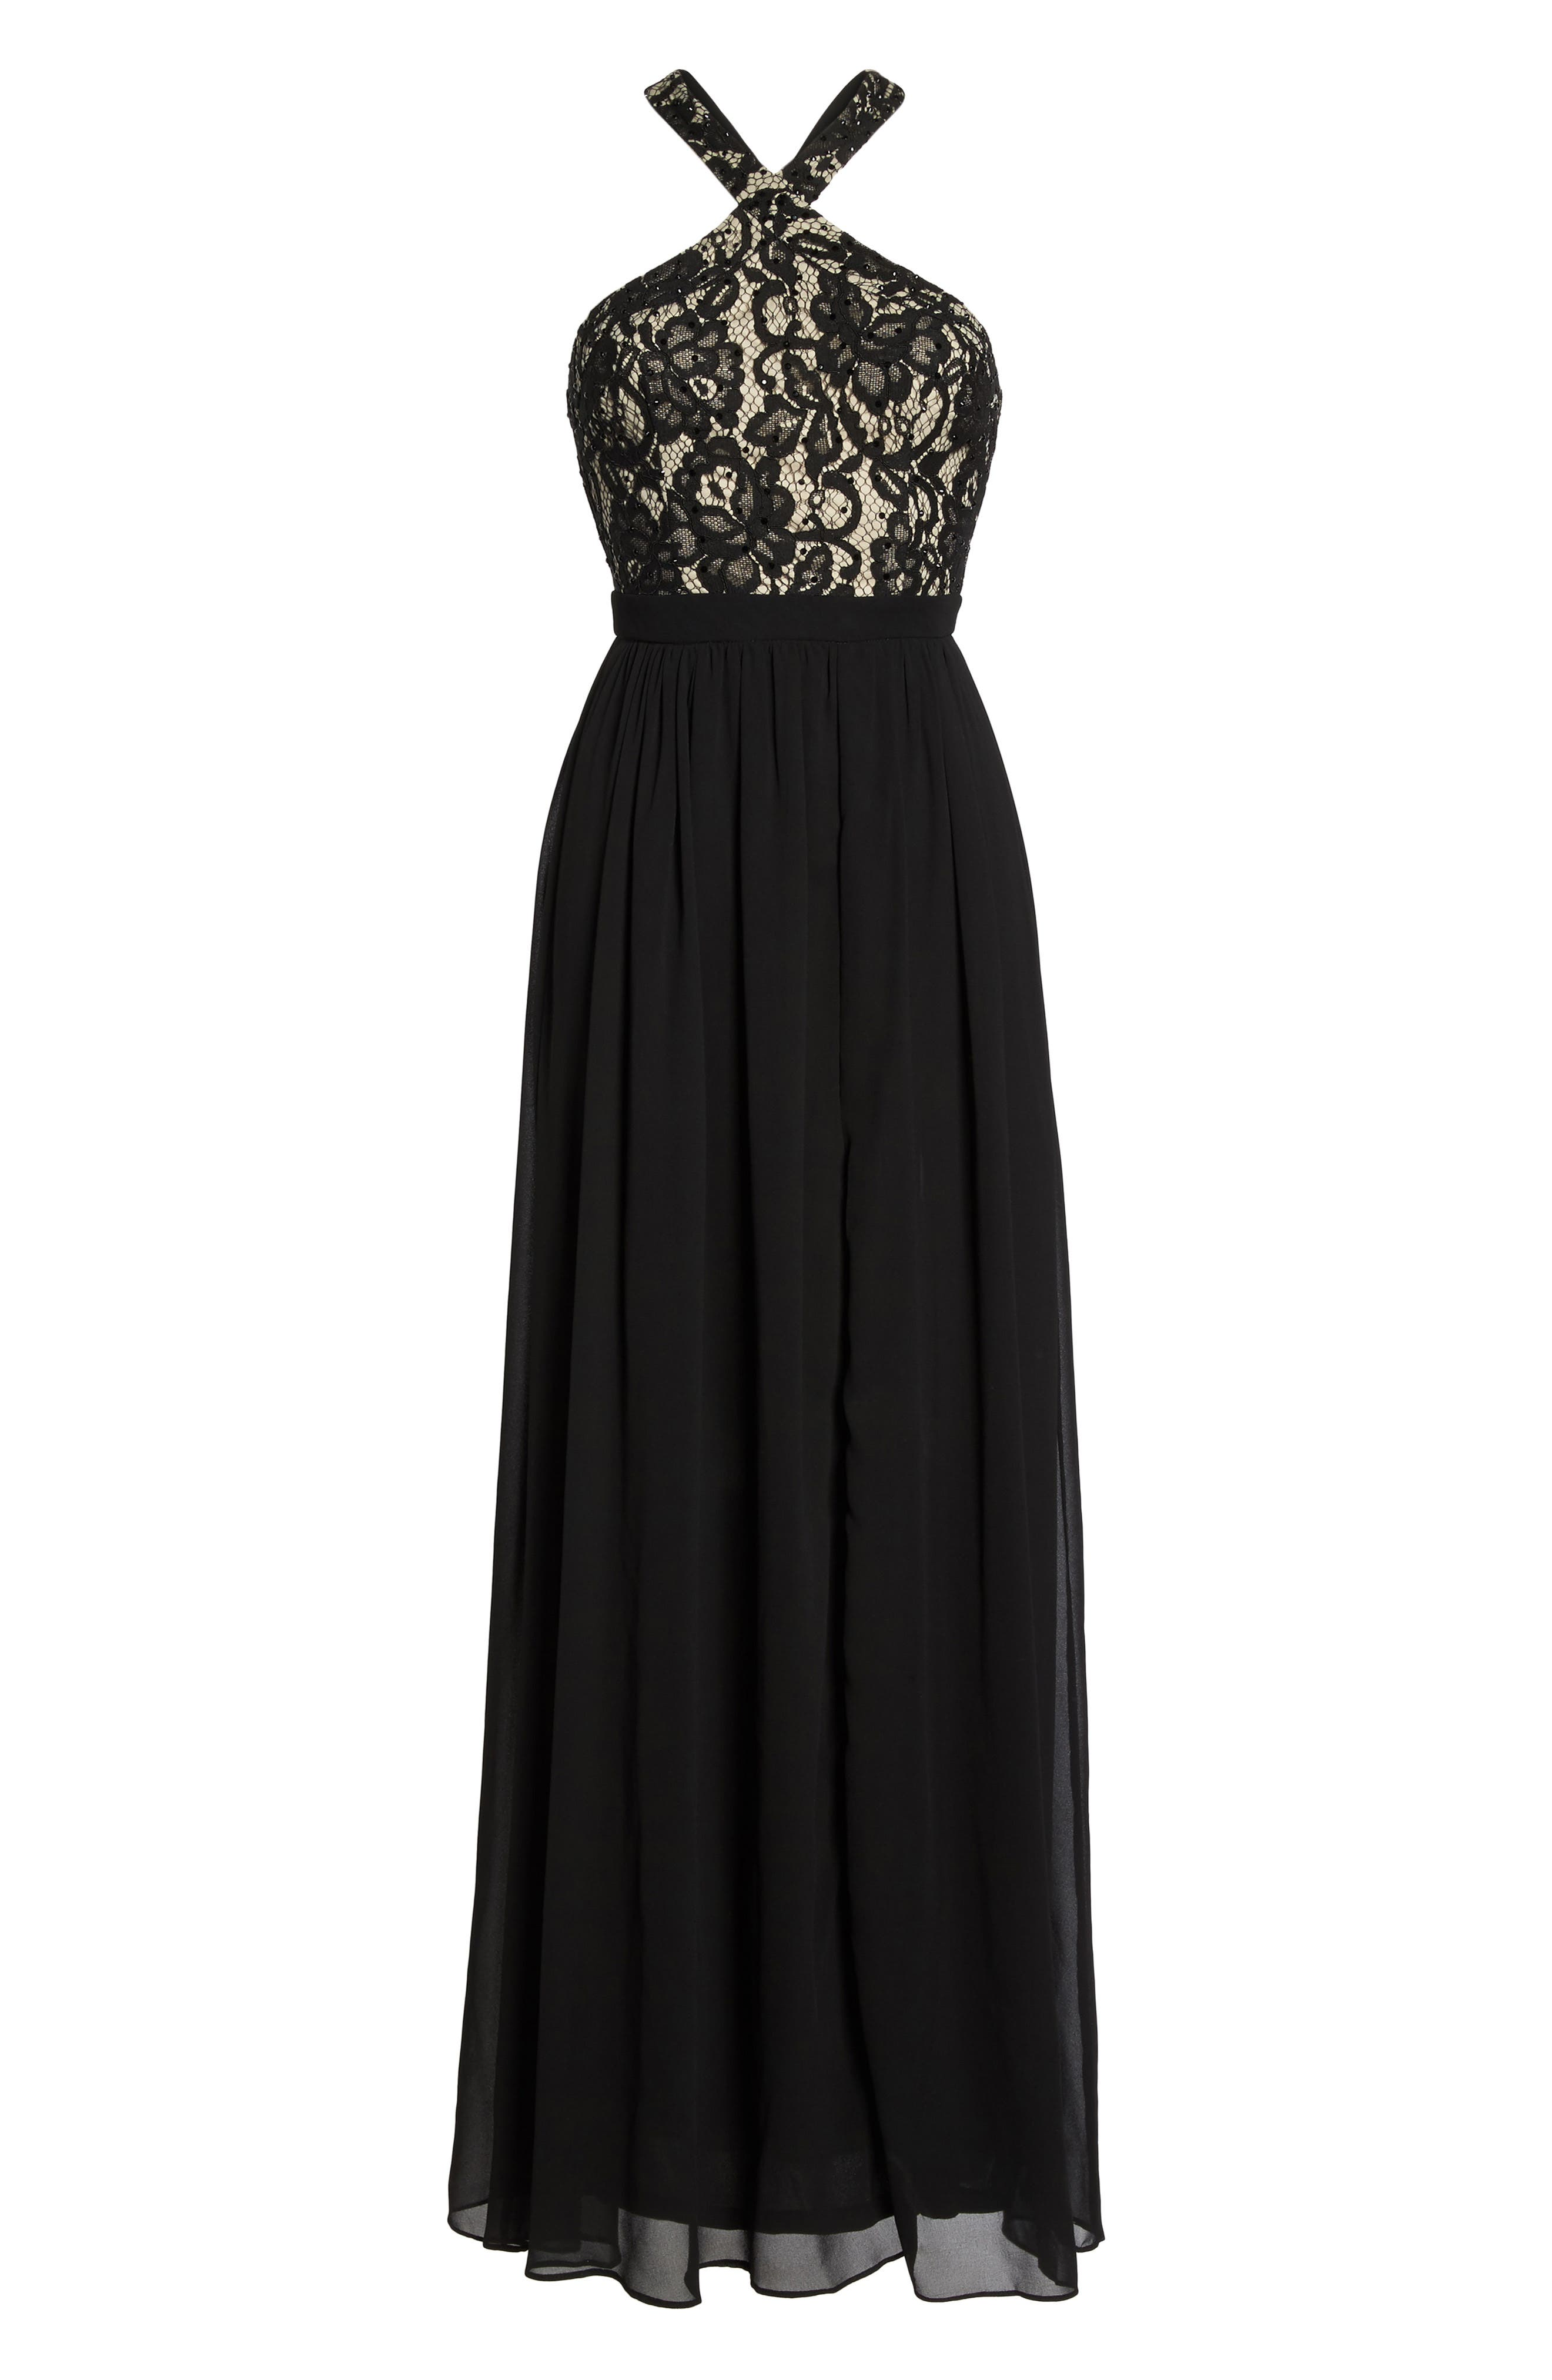 Sequin Lace & Chiffon Halter Gown,                             Alternate thumbnail 6, color,                             Black/ Nude